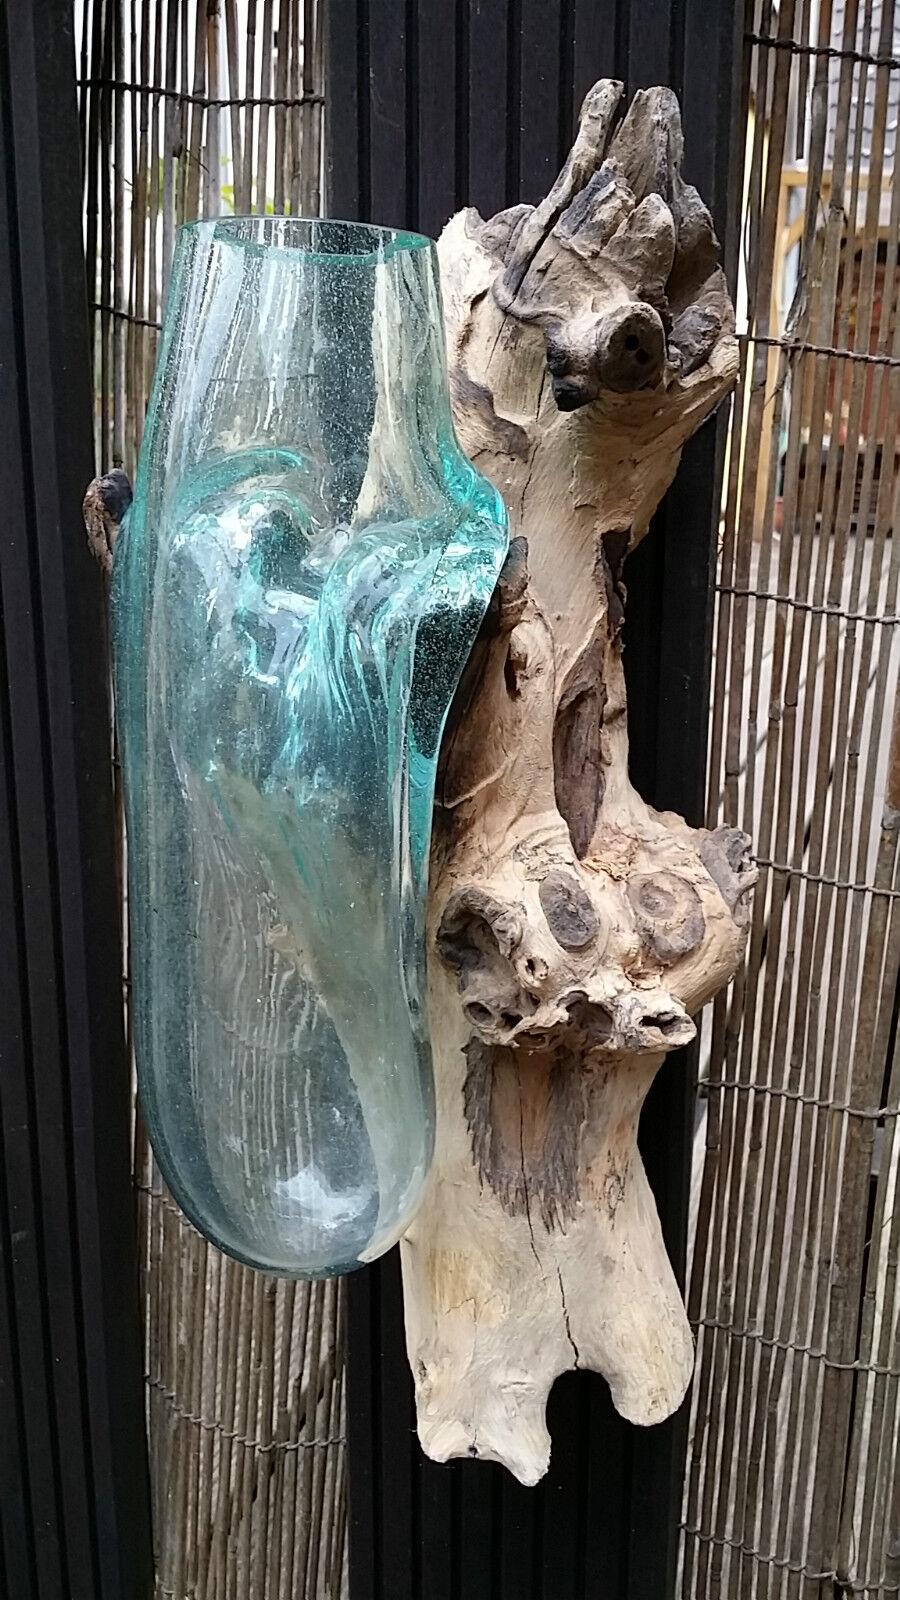 Wurzelholz Glas Vase -erhitzt + verschmolzen - mundgeblasen 32 43 x14cm